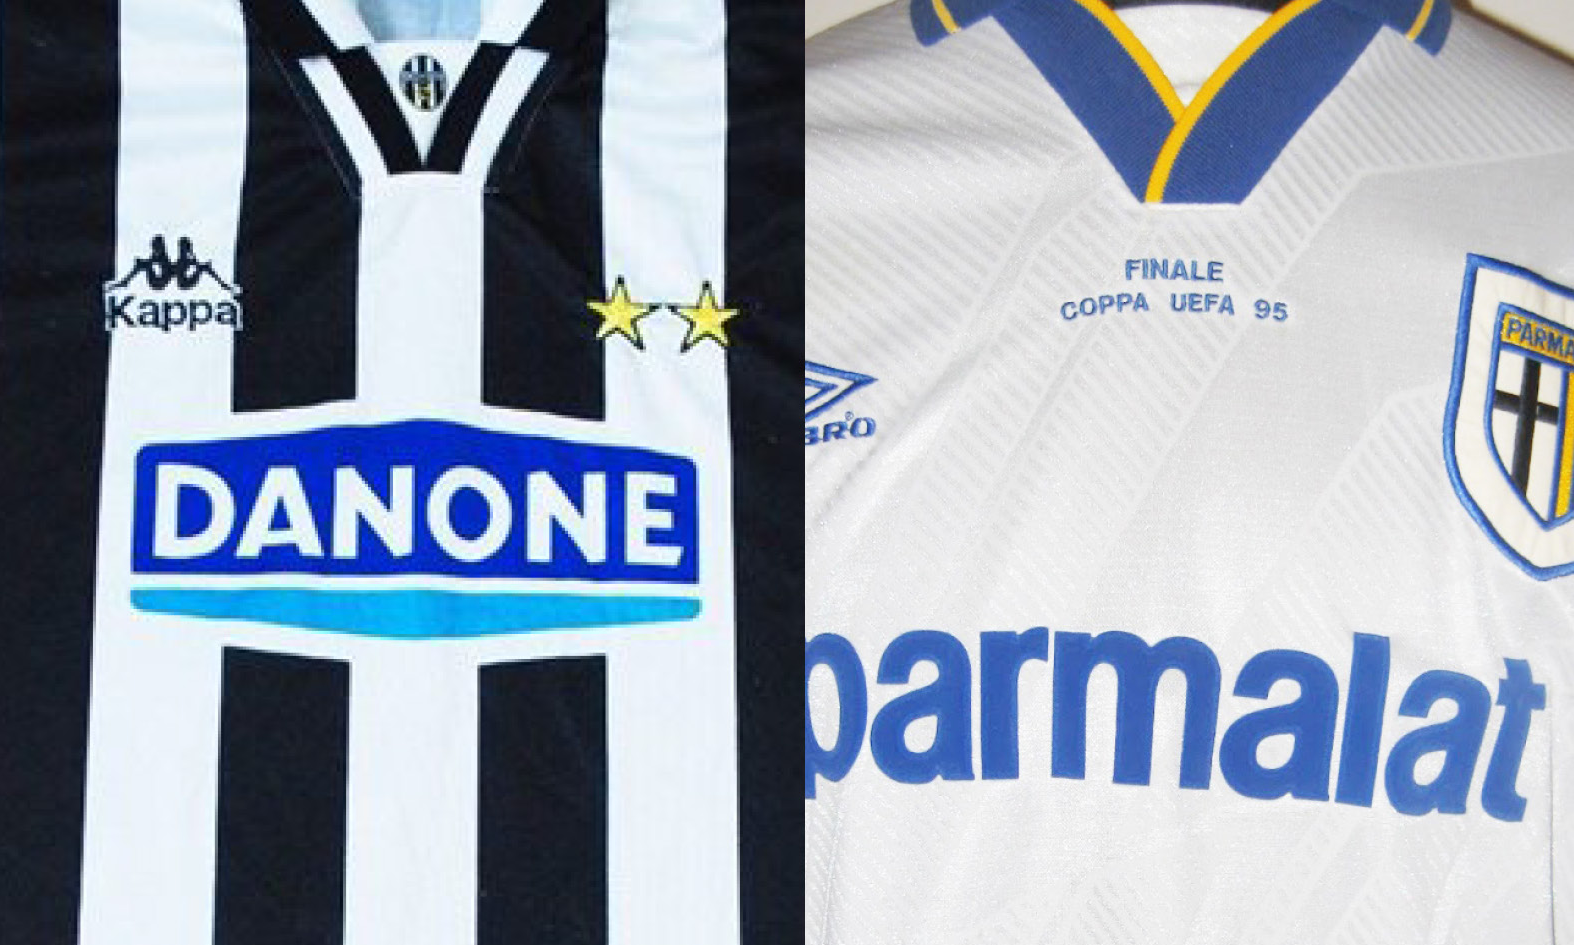 Juve-Parma 1994/95: a voi la scena!